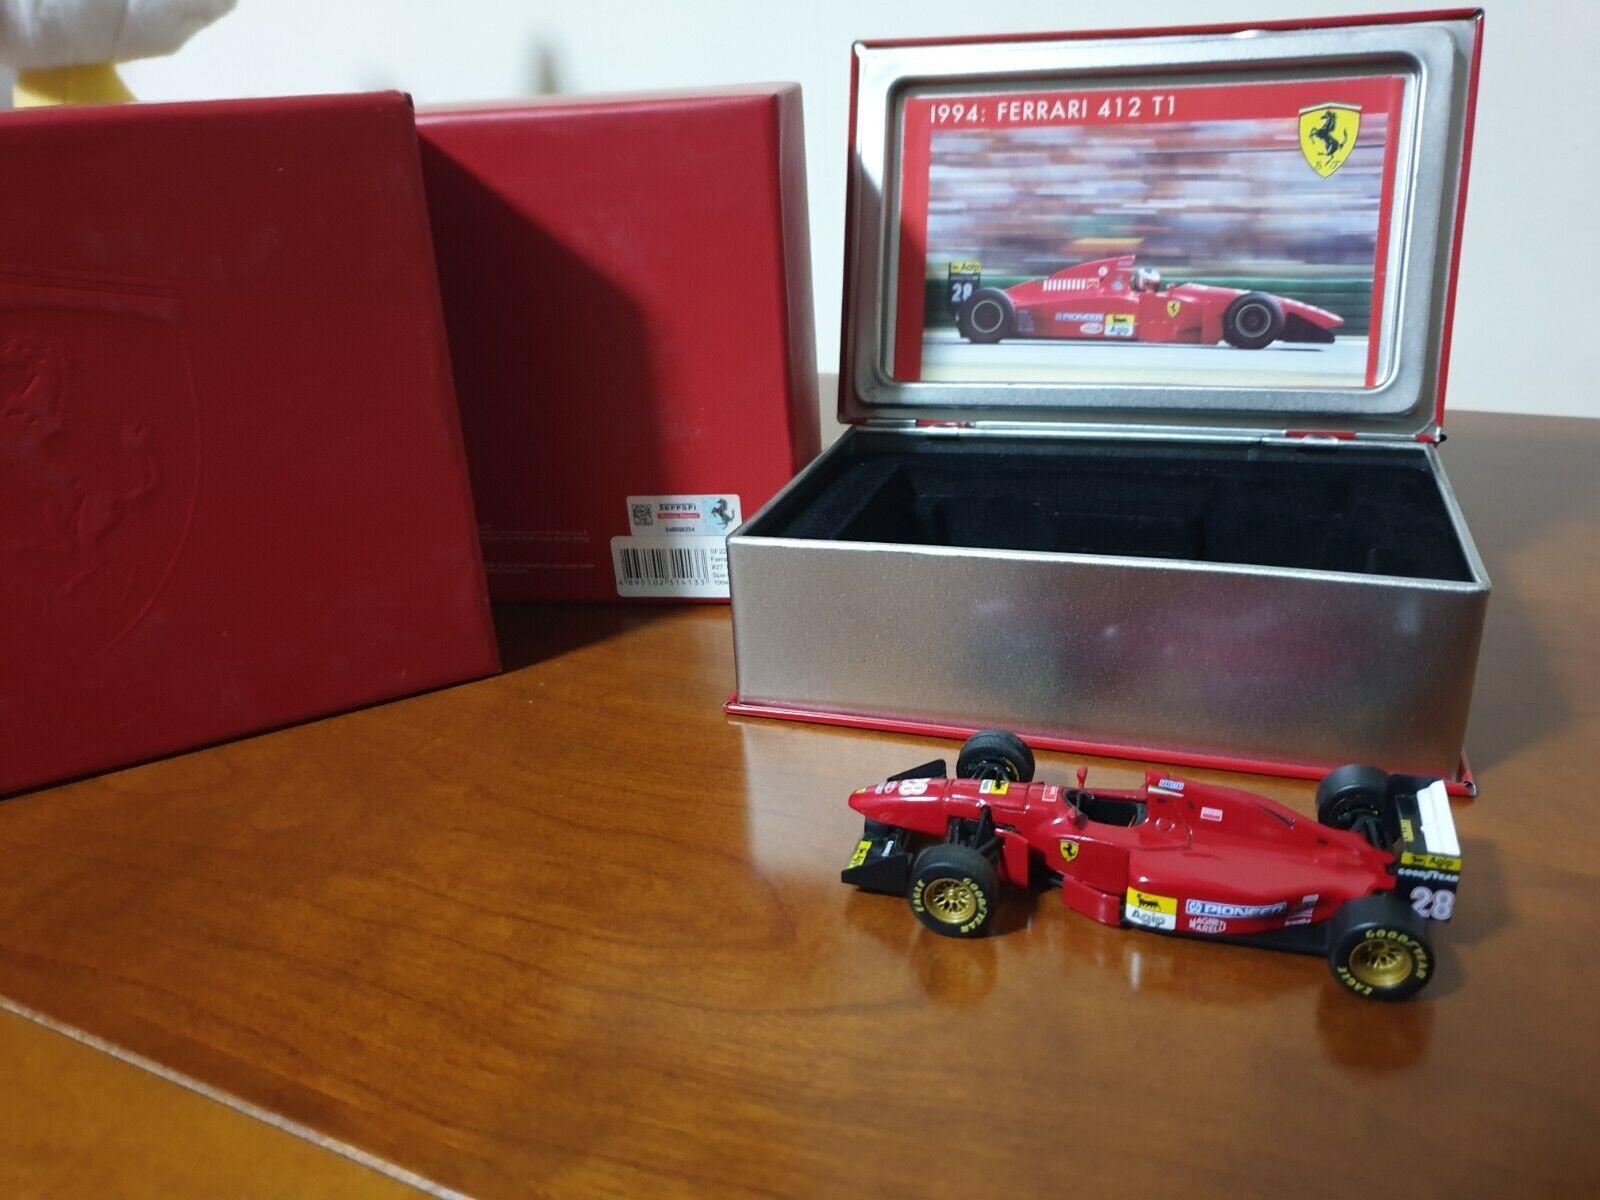 Model Ferrari 1 43 Ferrari F1 412 T1 1994 in metal box De Luxe